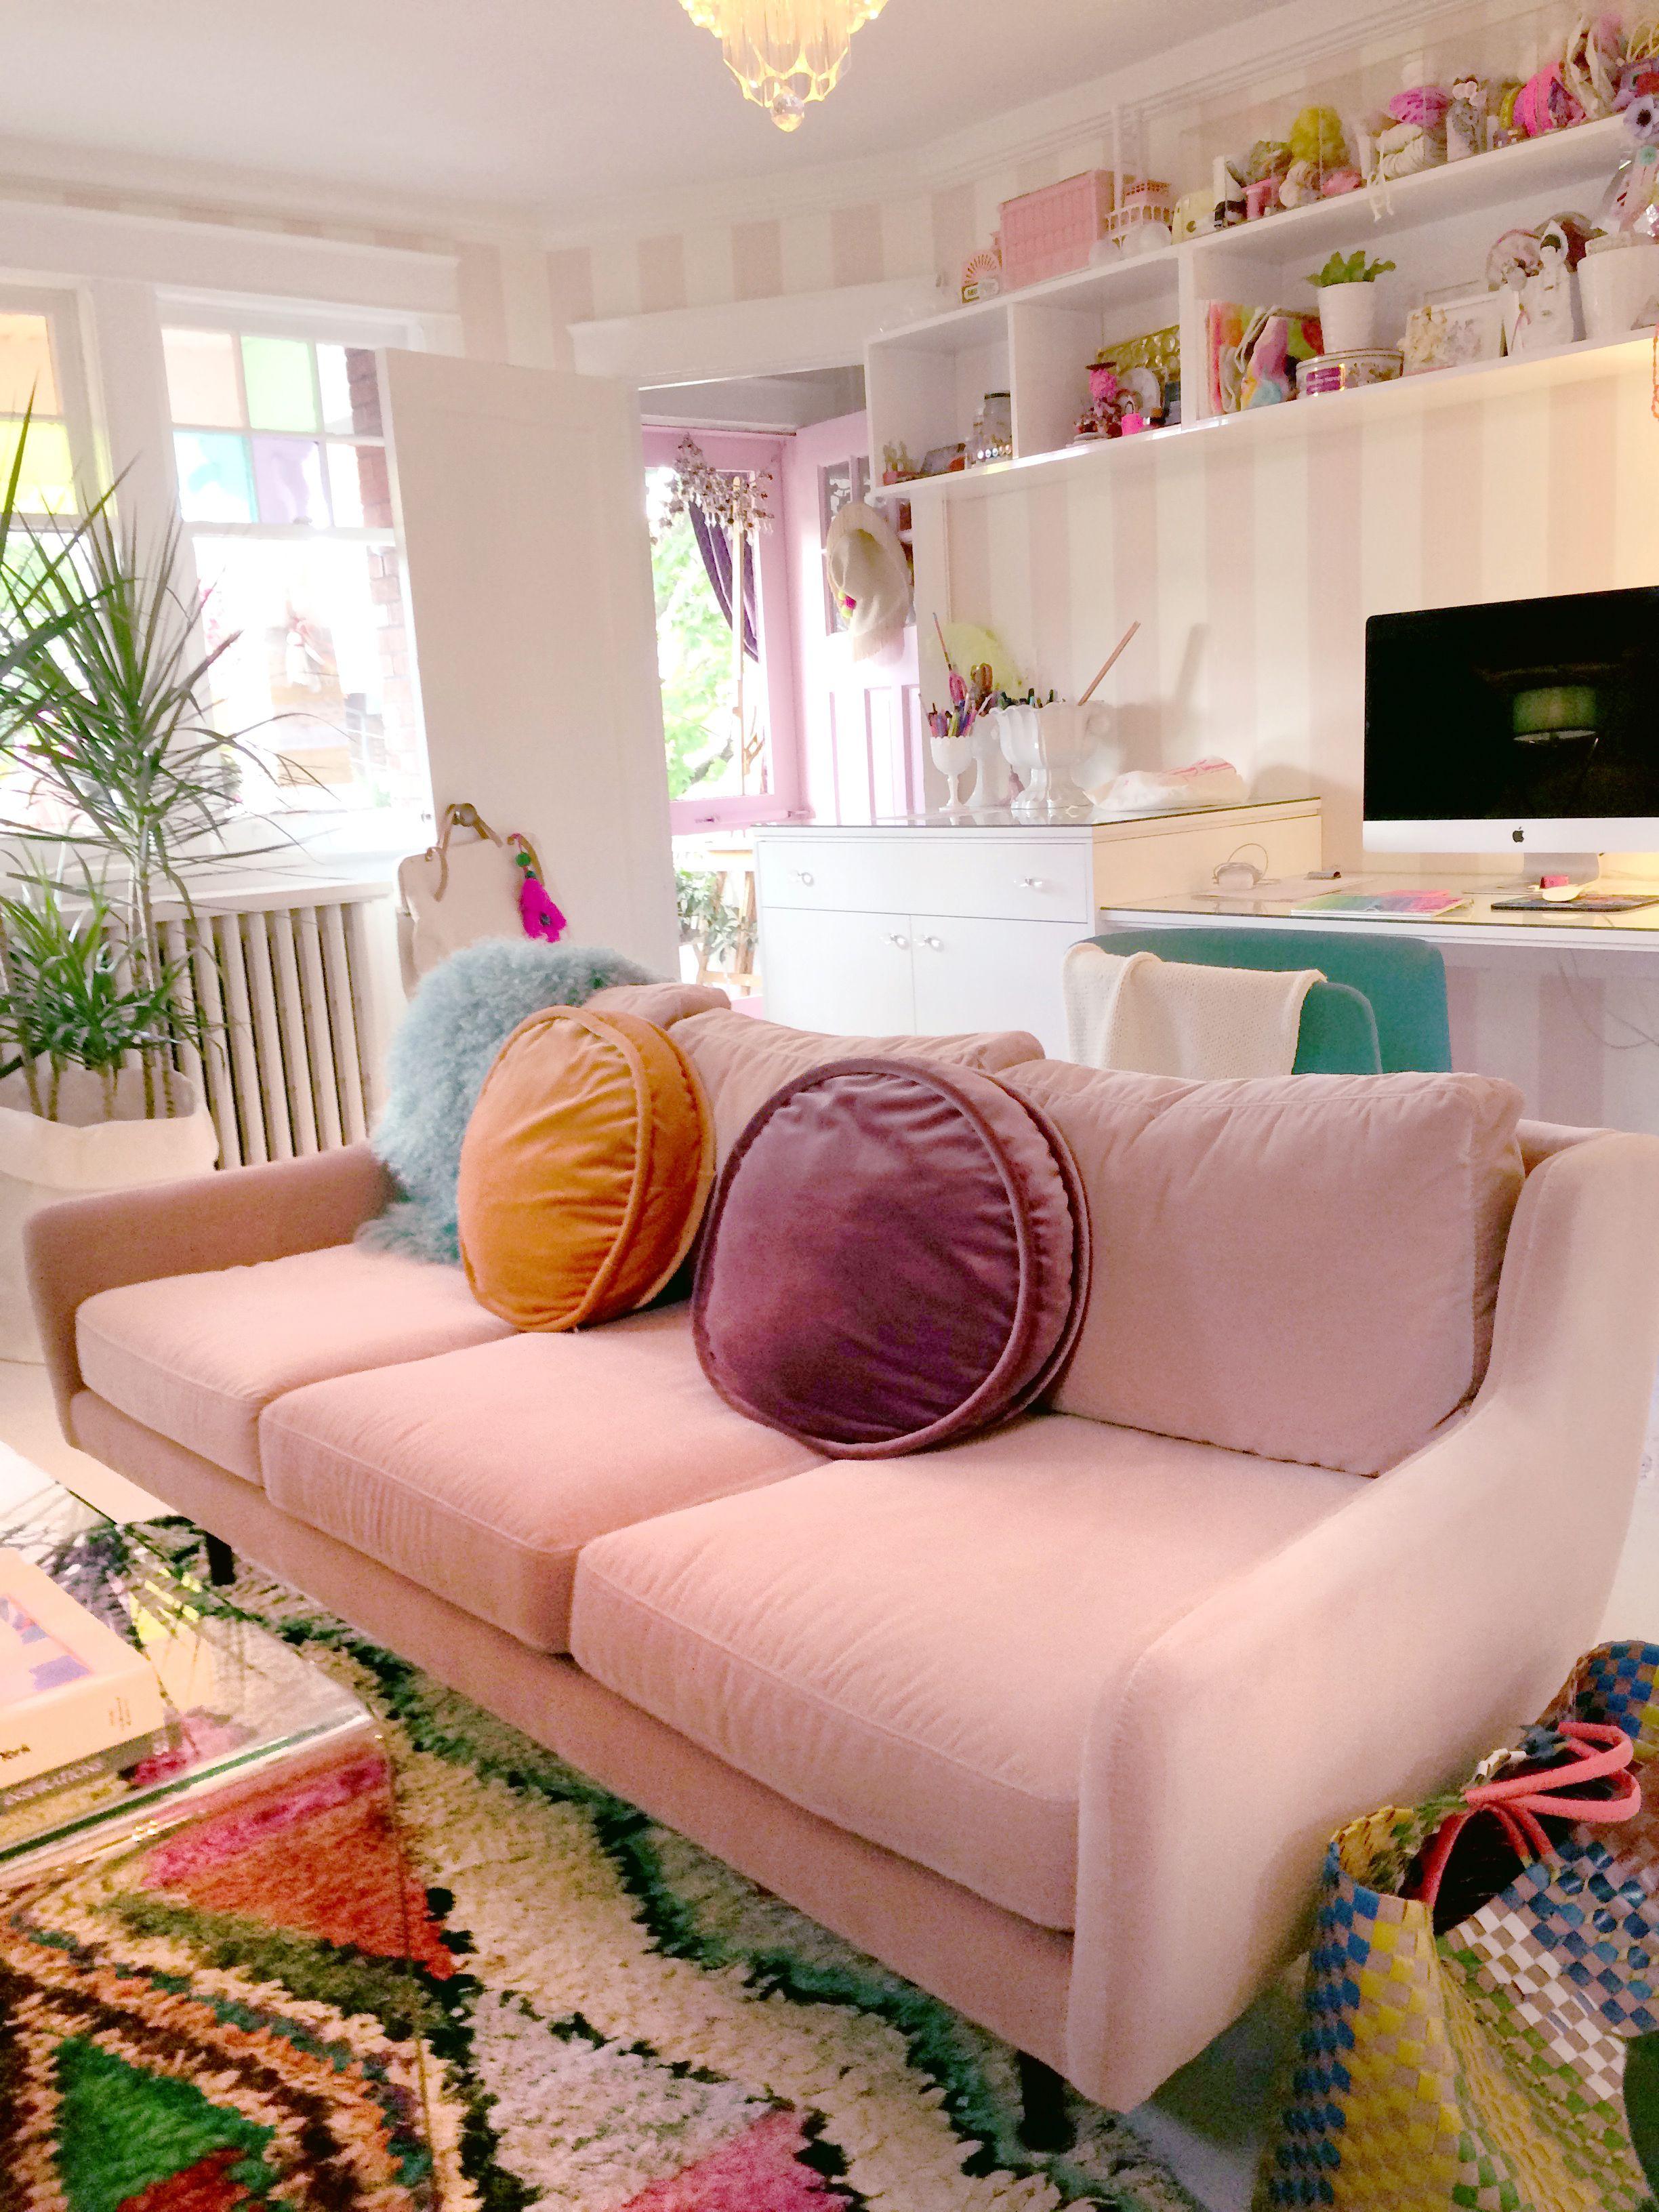 Creative Living Room Design On Budget: Tiffany's Creative Living Room Space Dreamy Pink Sofa With